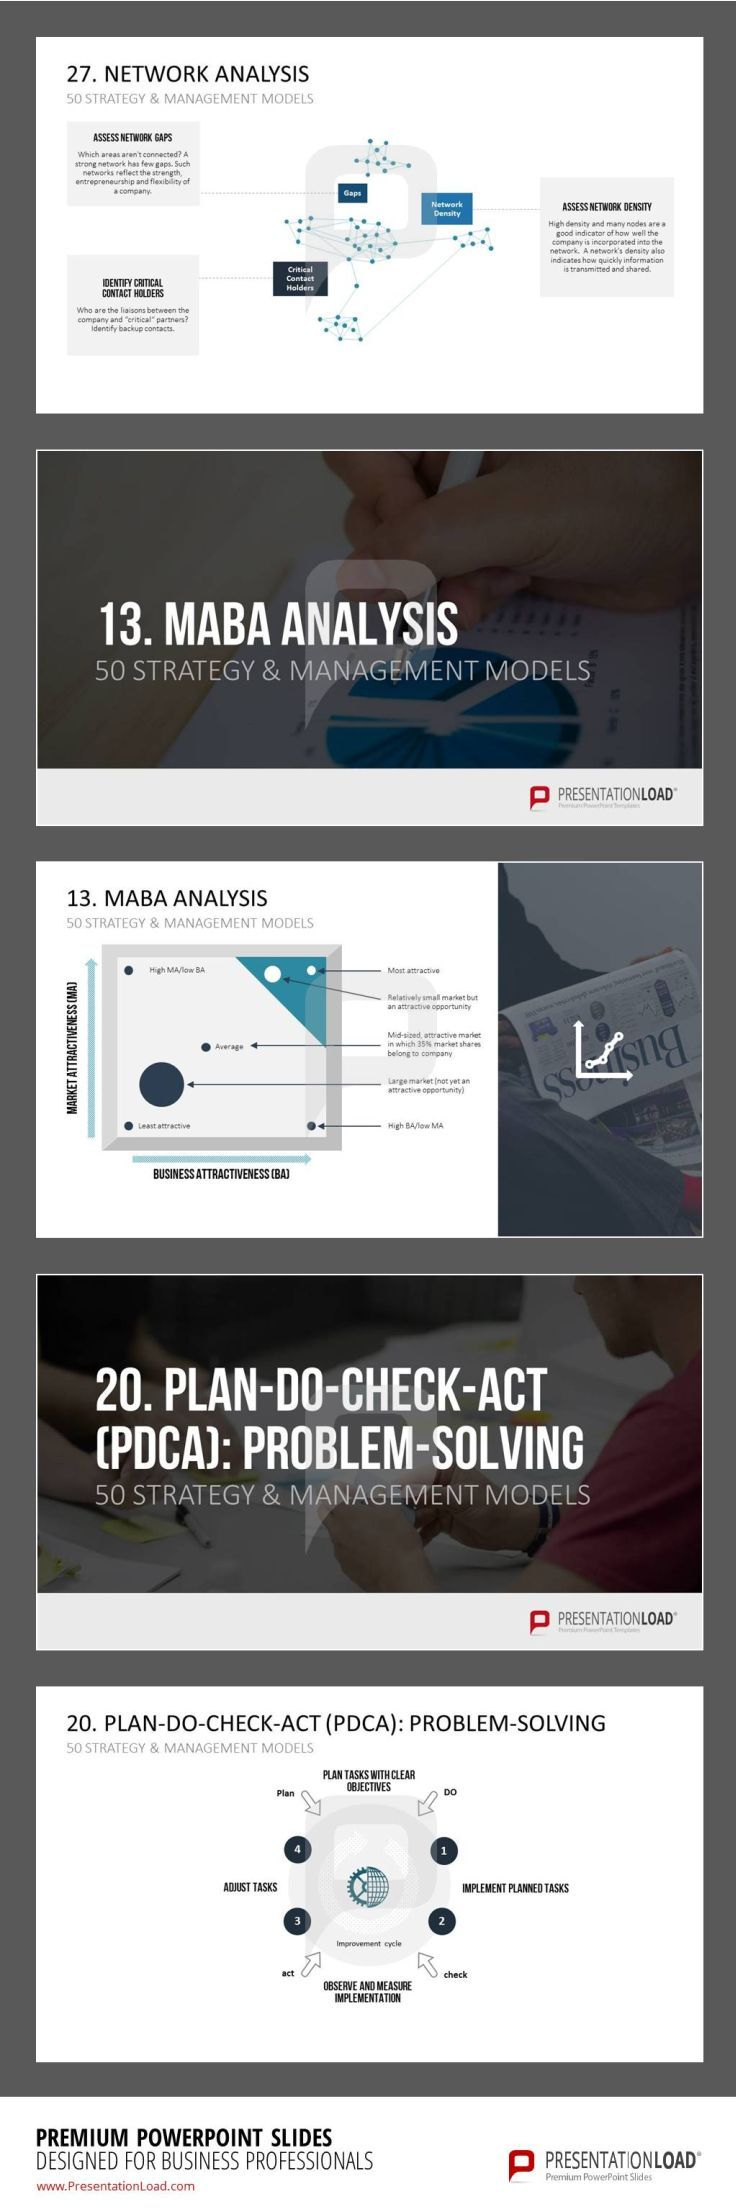 21 best Strategic Planning images on Pinterest   Strategic planning ...